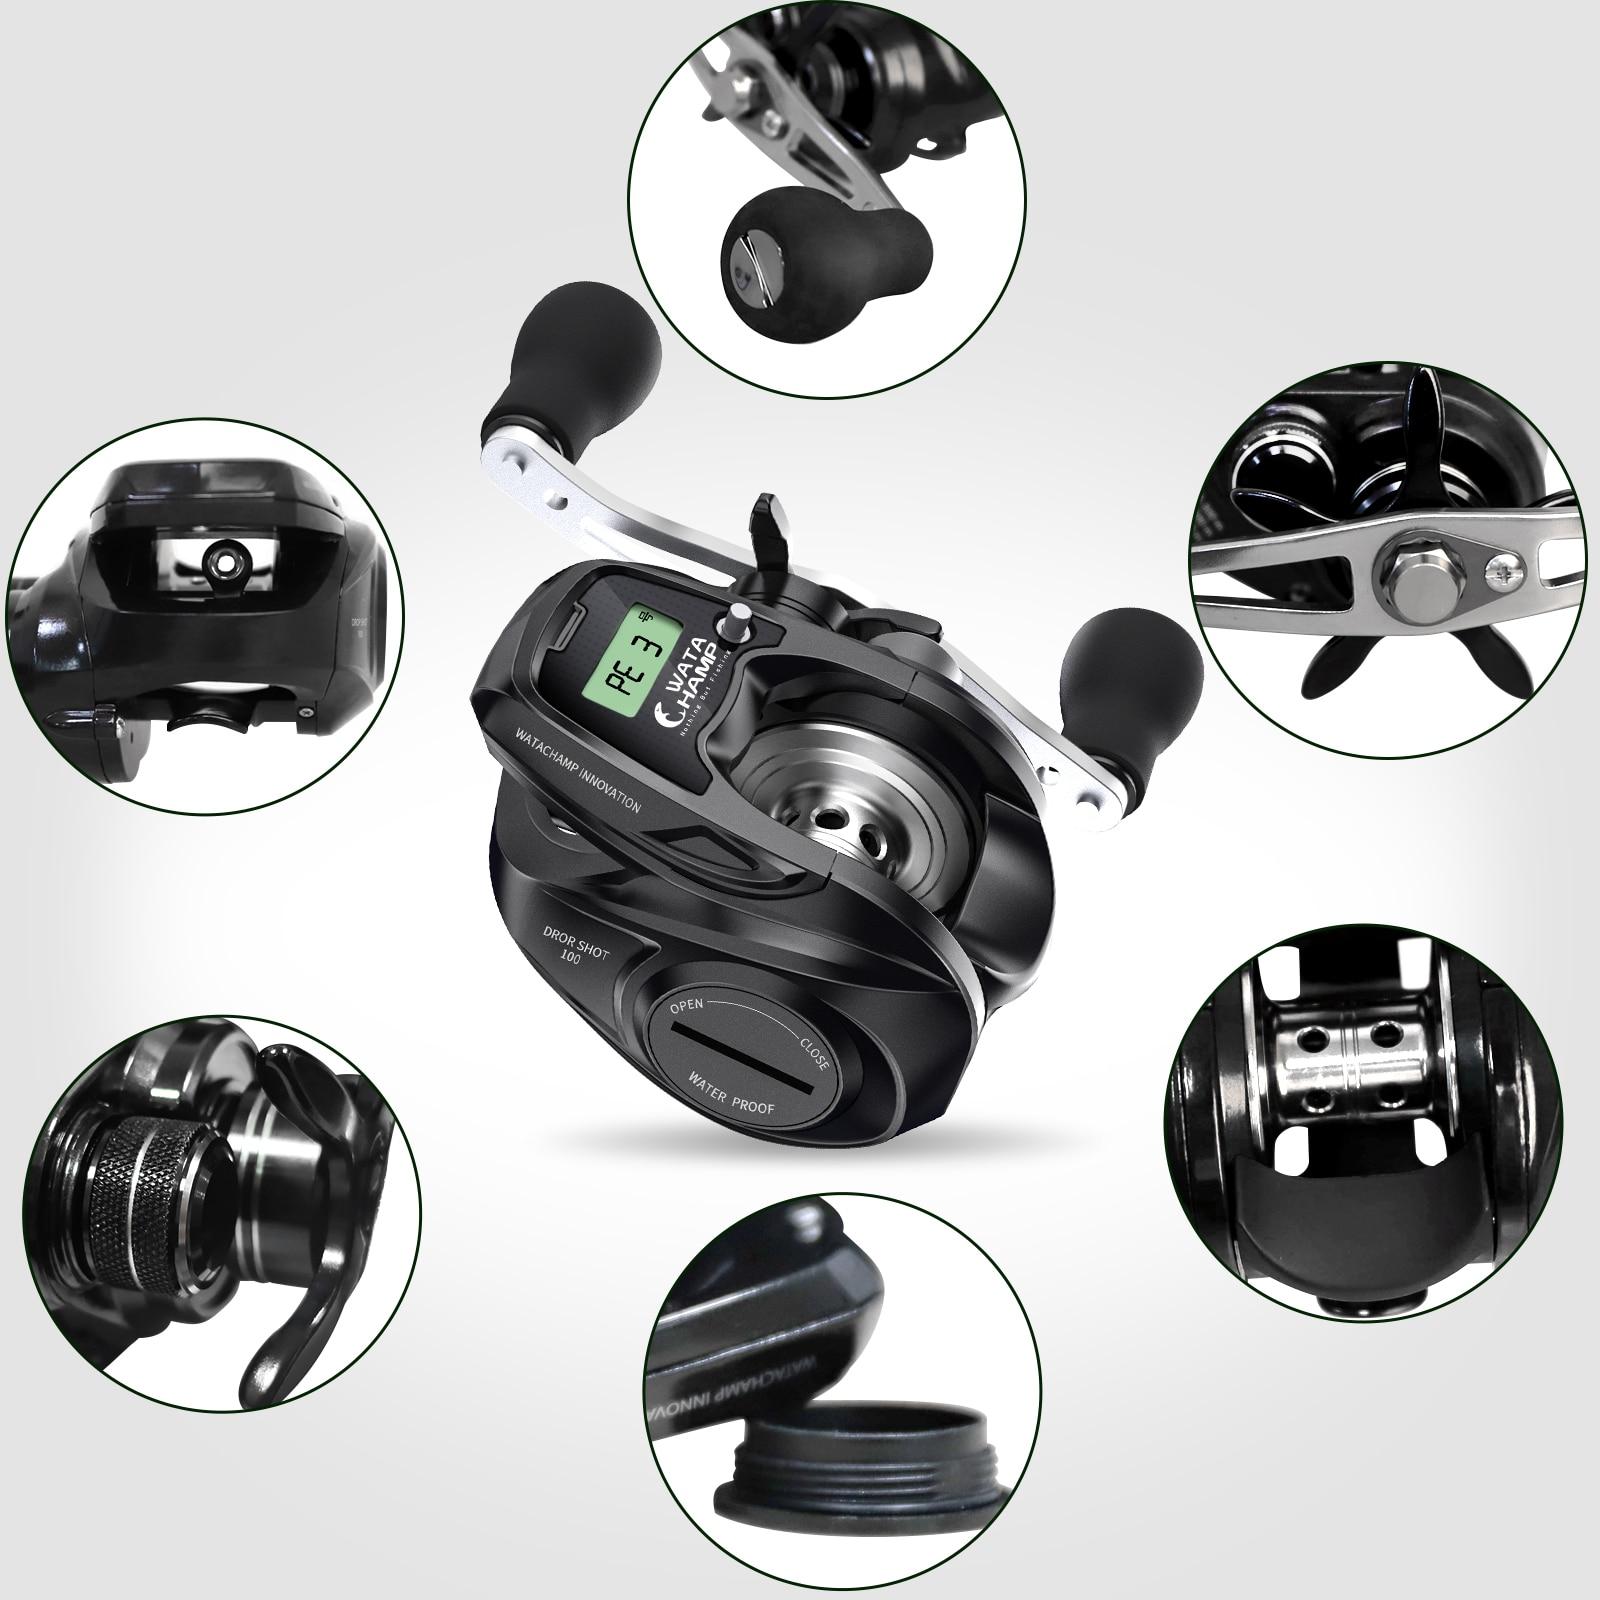 WataChamp Fishing baitcasting Reel  6.2:1 Gear Ratio 6KG Max Drag With Line Counter Fishing Tackle Gear Digital Display enlarge